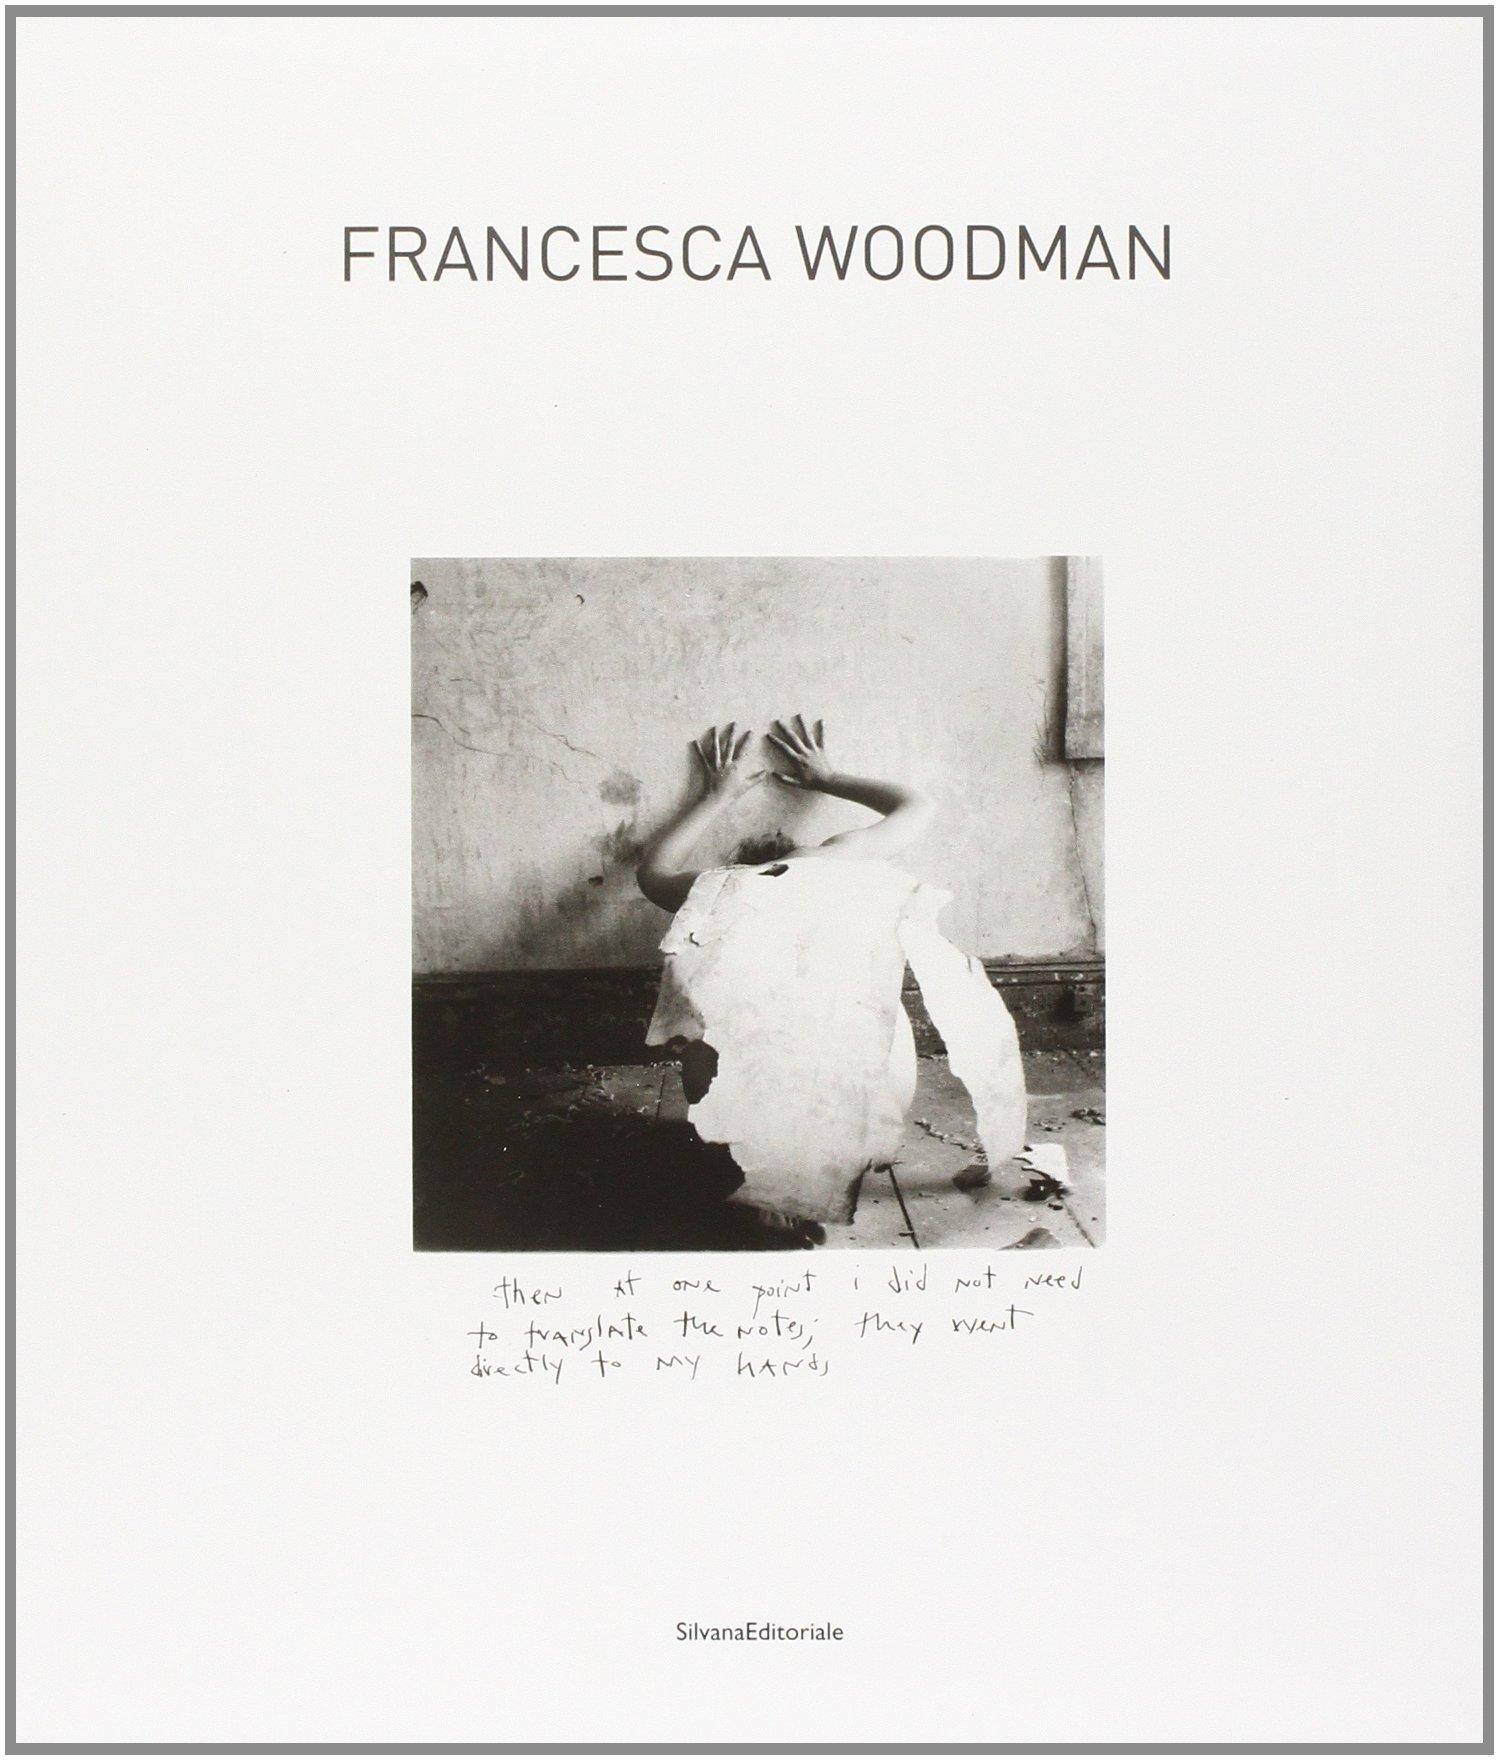 Francesca Woodman. Catalogo della mostra (Siena, 25 settembre 2009-10 gennaio 2010). Ediz. italiana e inglese (Inglese) Copertina flessibile – 1 ott 2009 M. Pierini P. Neri Silvana 8836614906